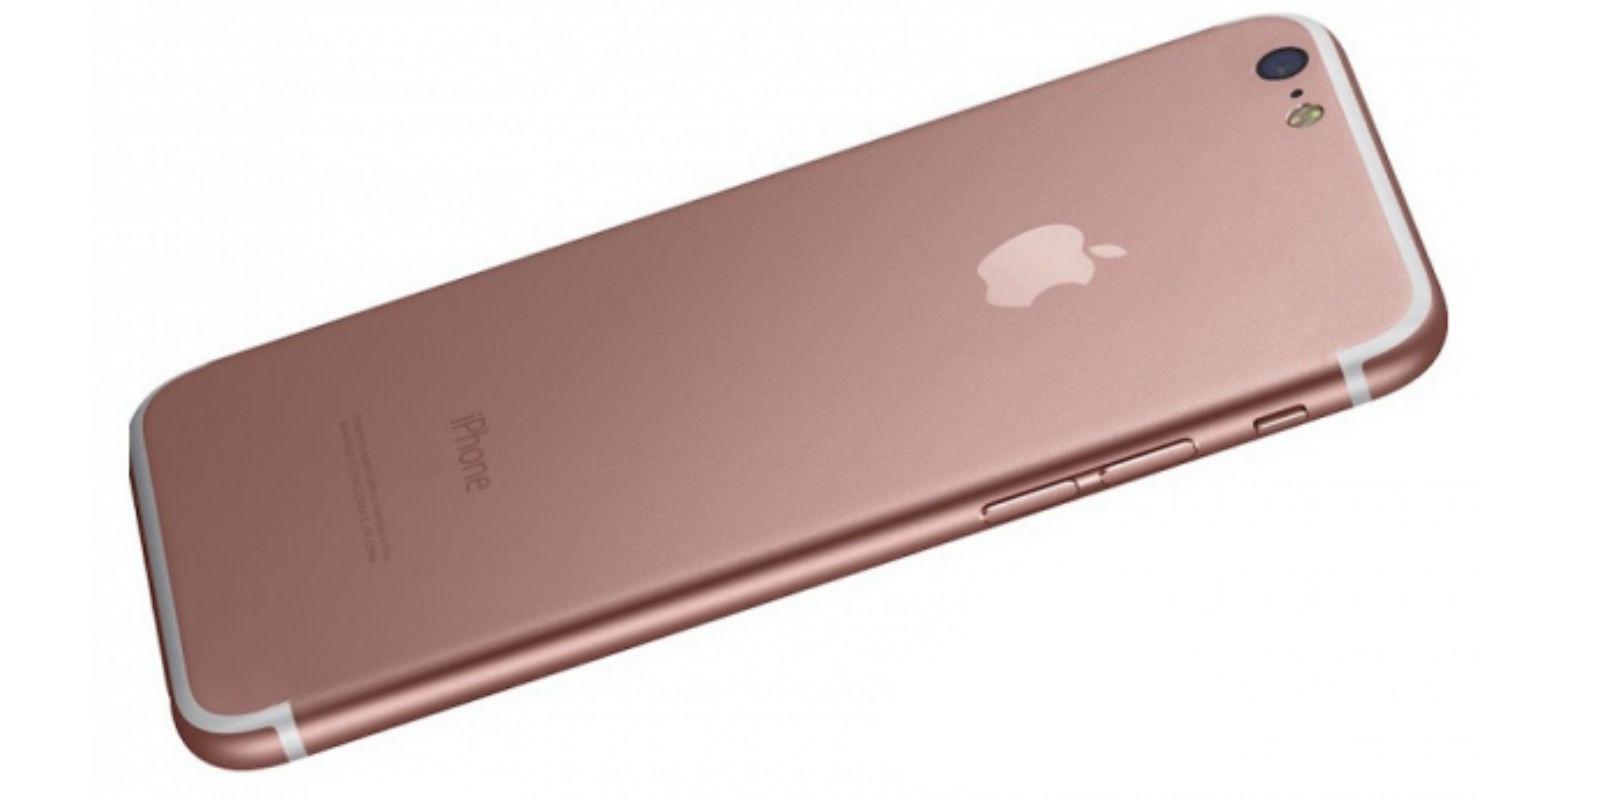 iPhone Flat Camera